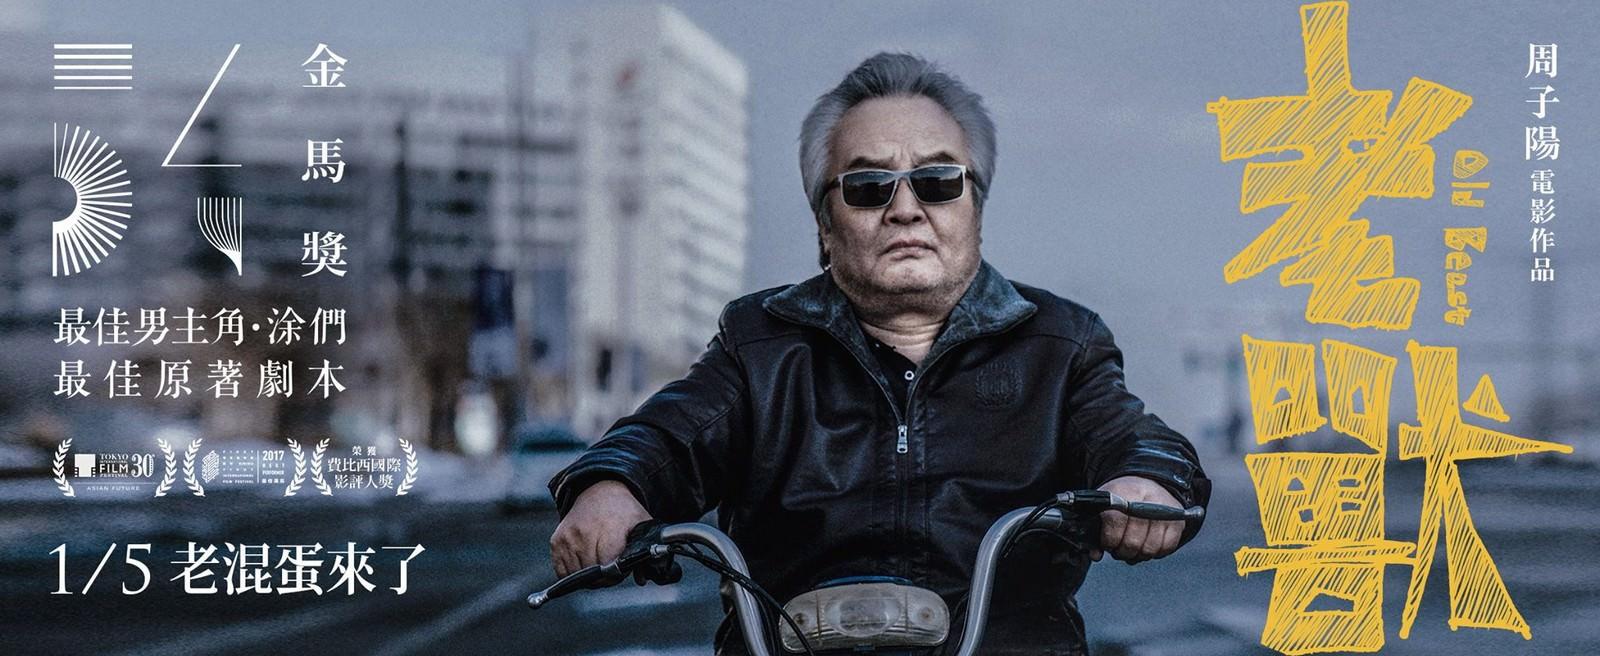 Movie, 老兽(中國, 2017) / 老獸(台灣) / Old Beast(英文), 電影海報, 台灣, 橫版(非正式)